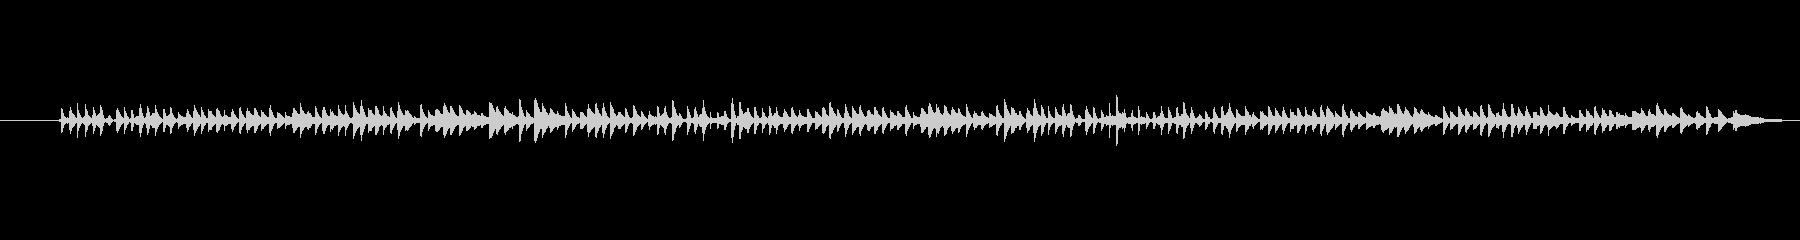 ma-ko song 1001の未再生の波形